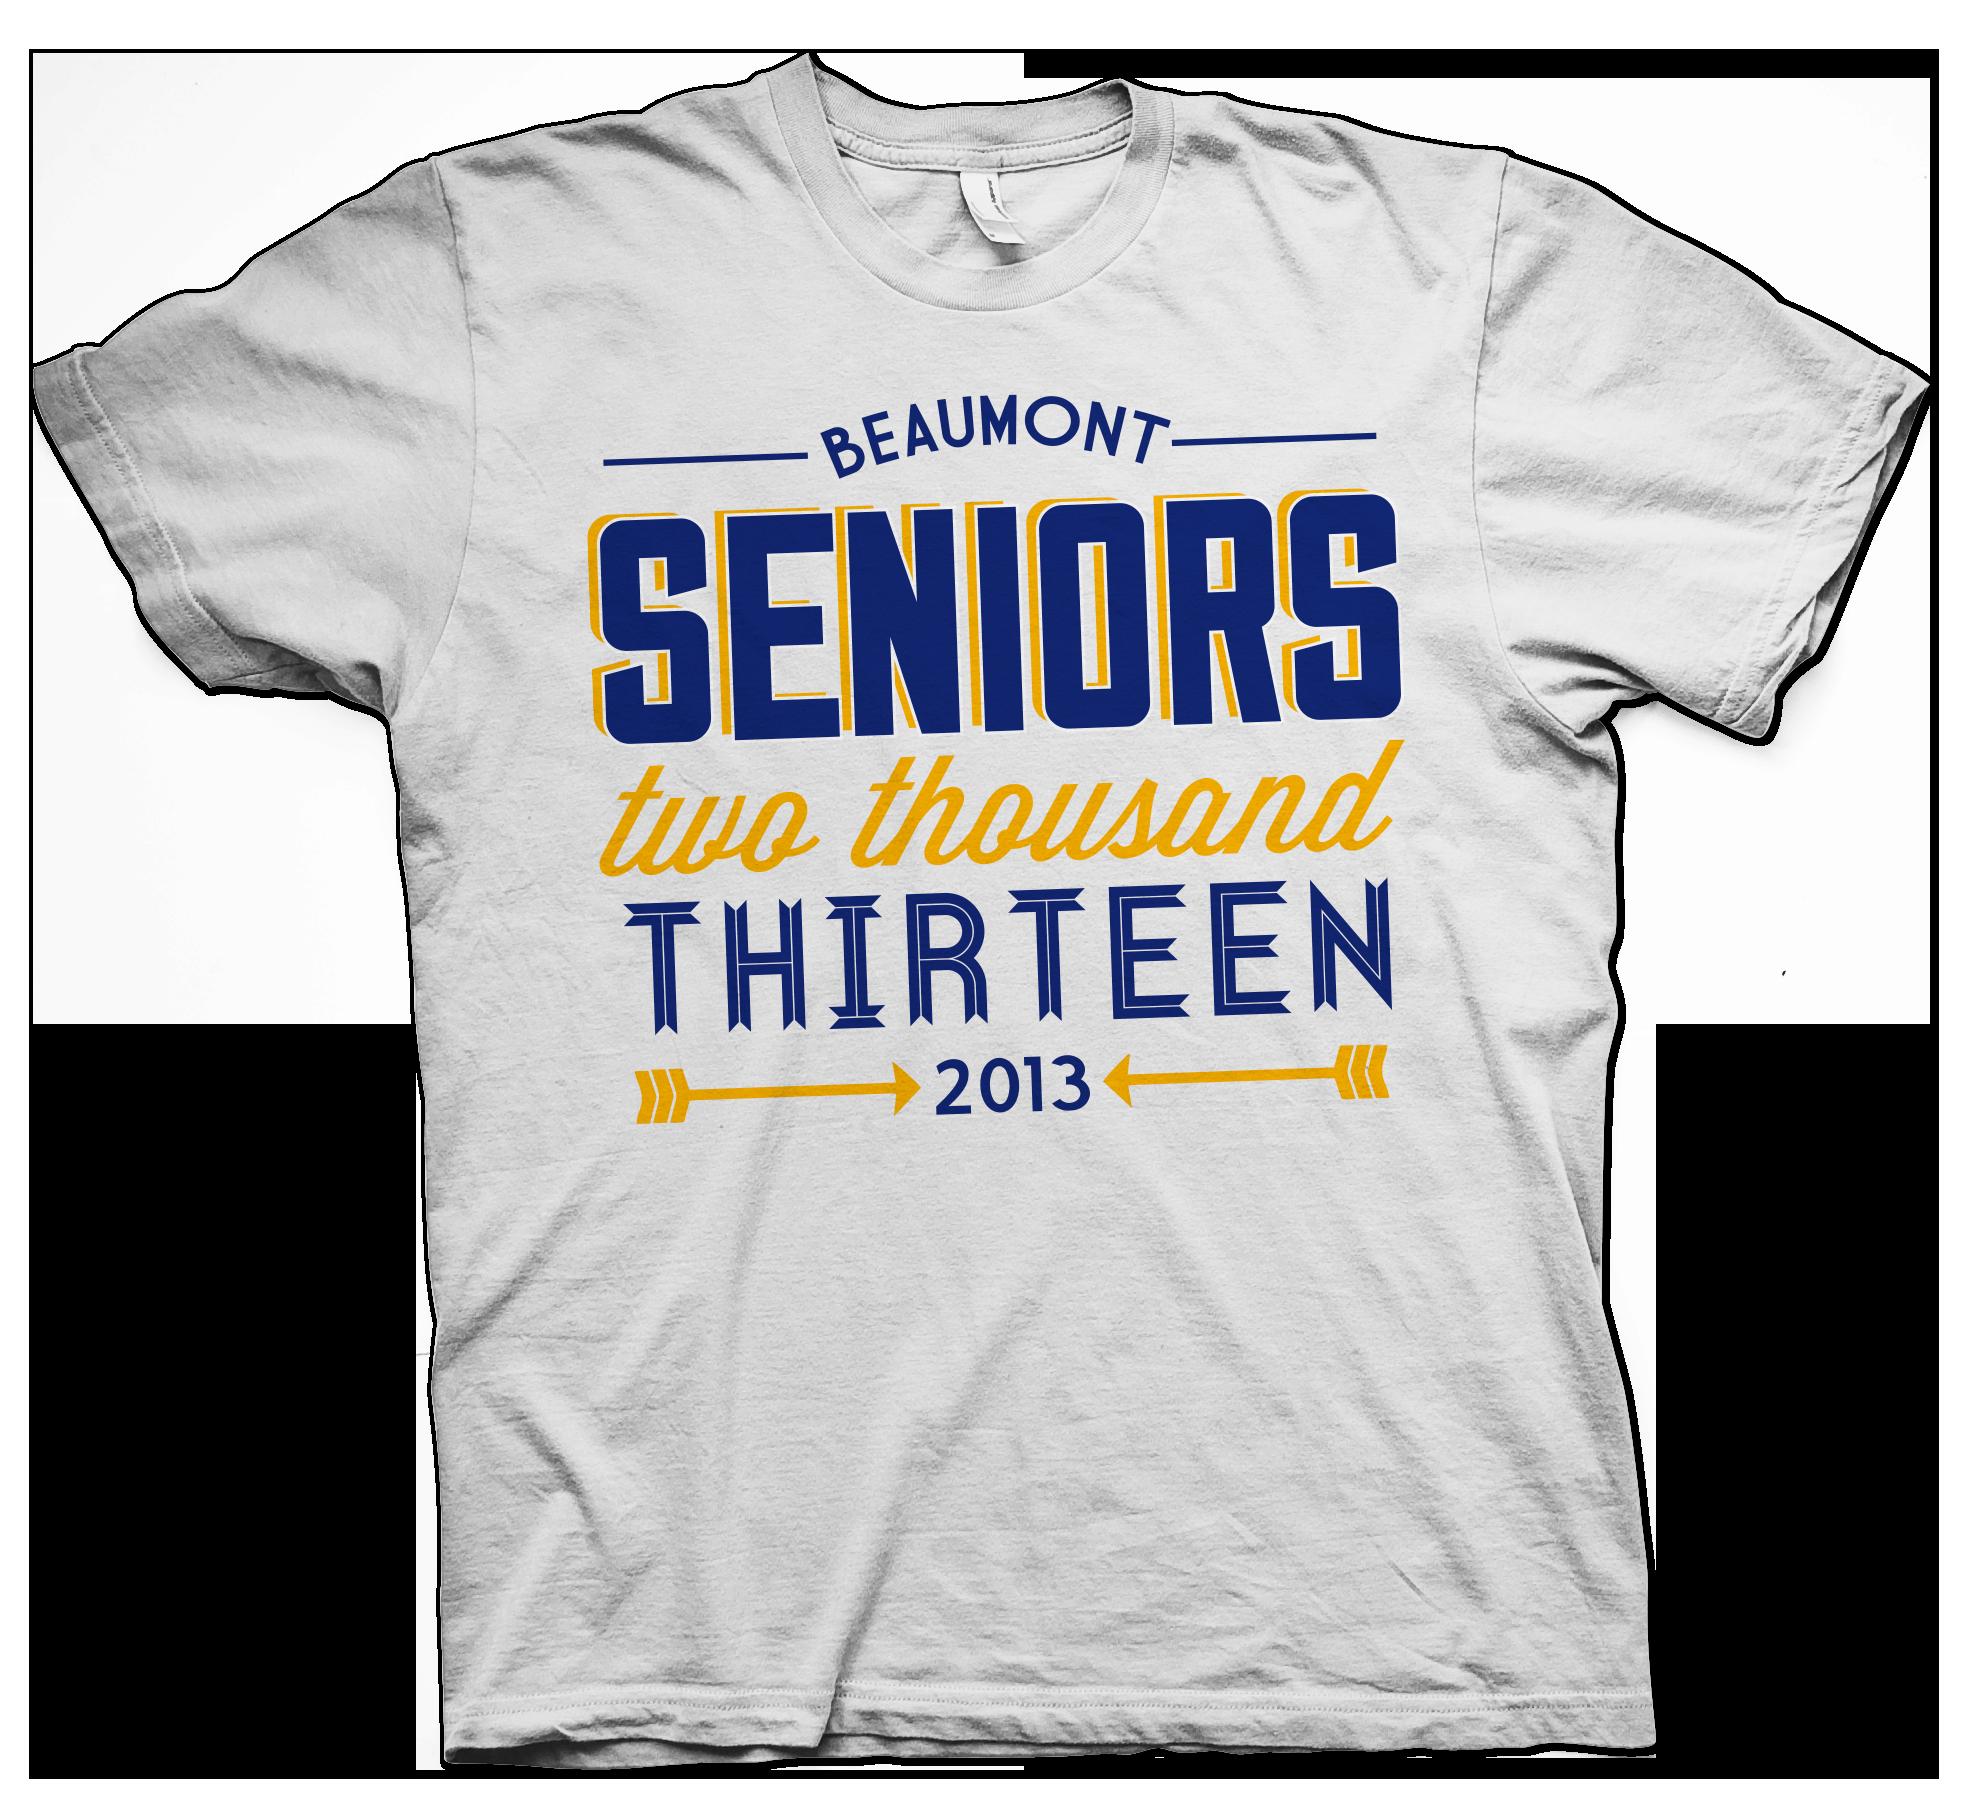 class shirts - Google Search | sga | Pinterest | Senior shirts ...